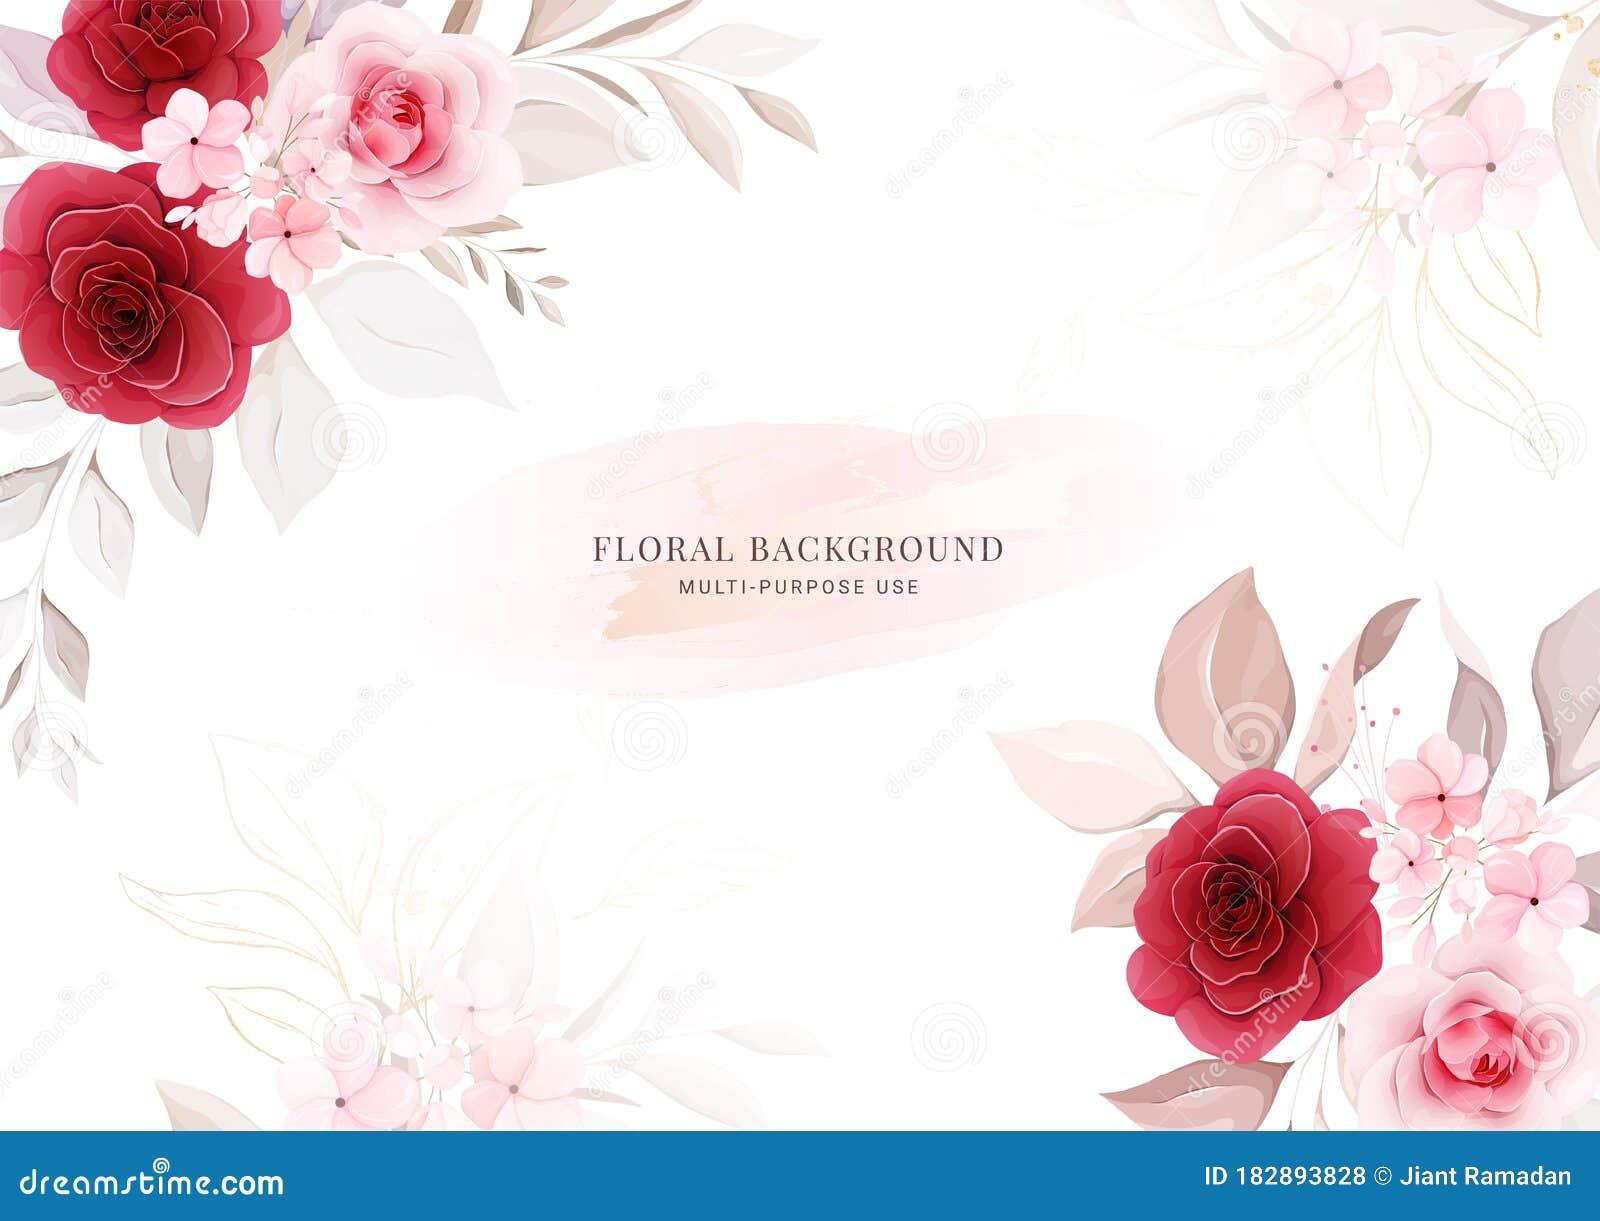 Floral Background. Horizontal Wedding Invitation Card Template ...